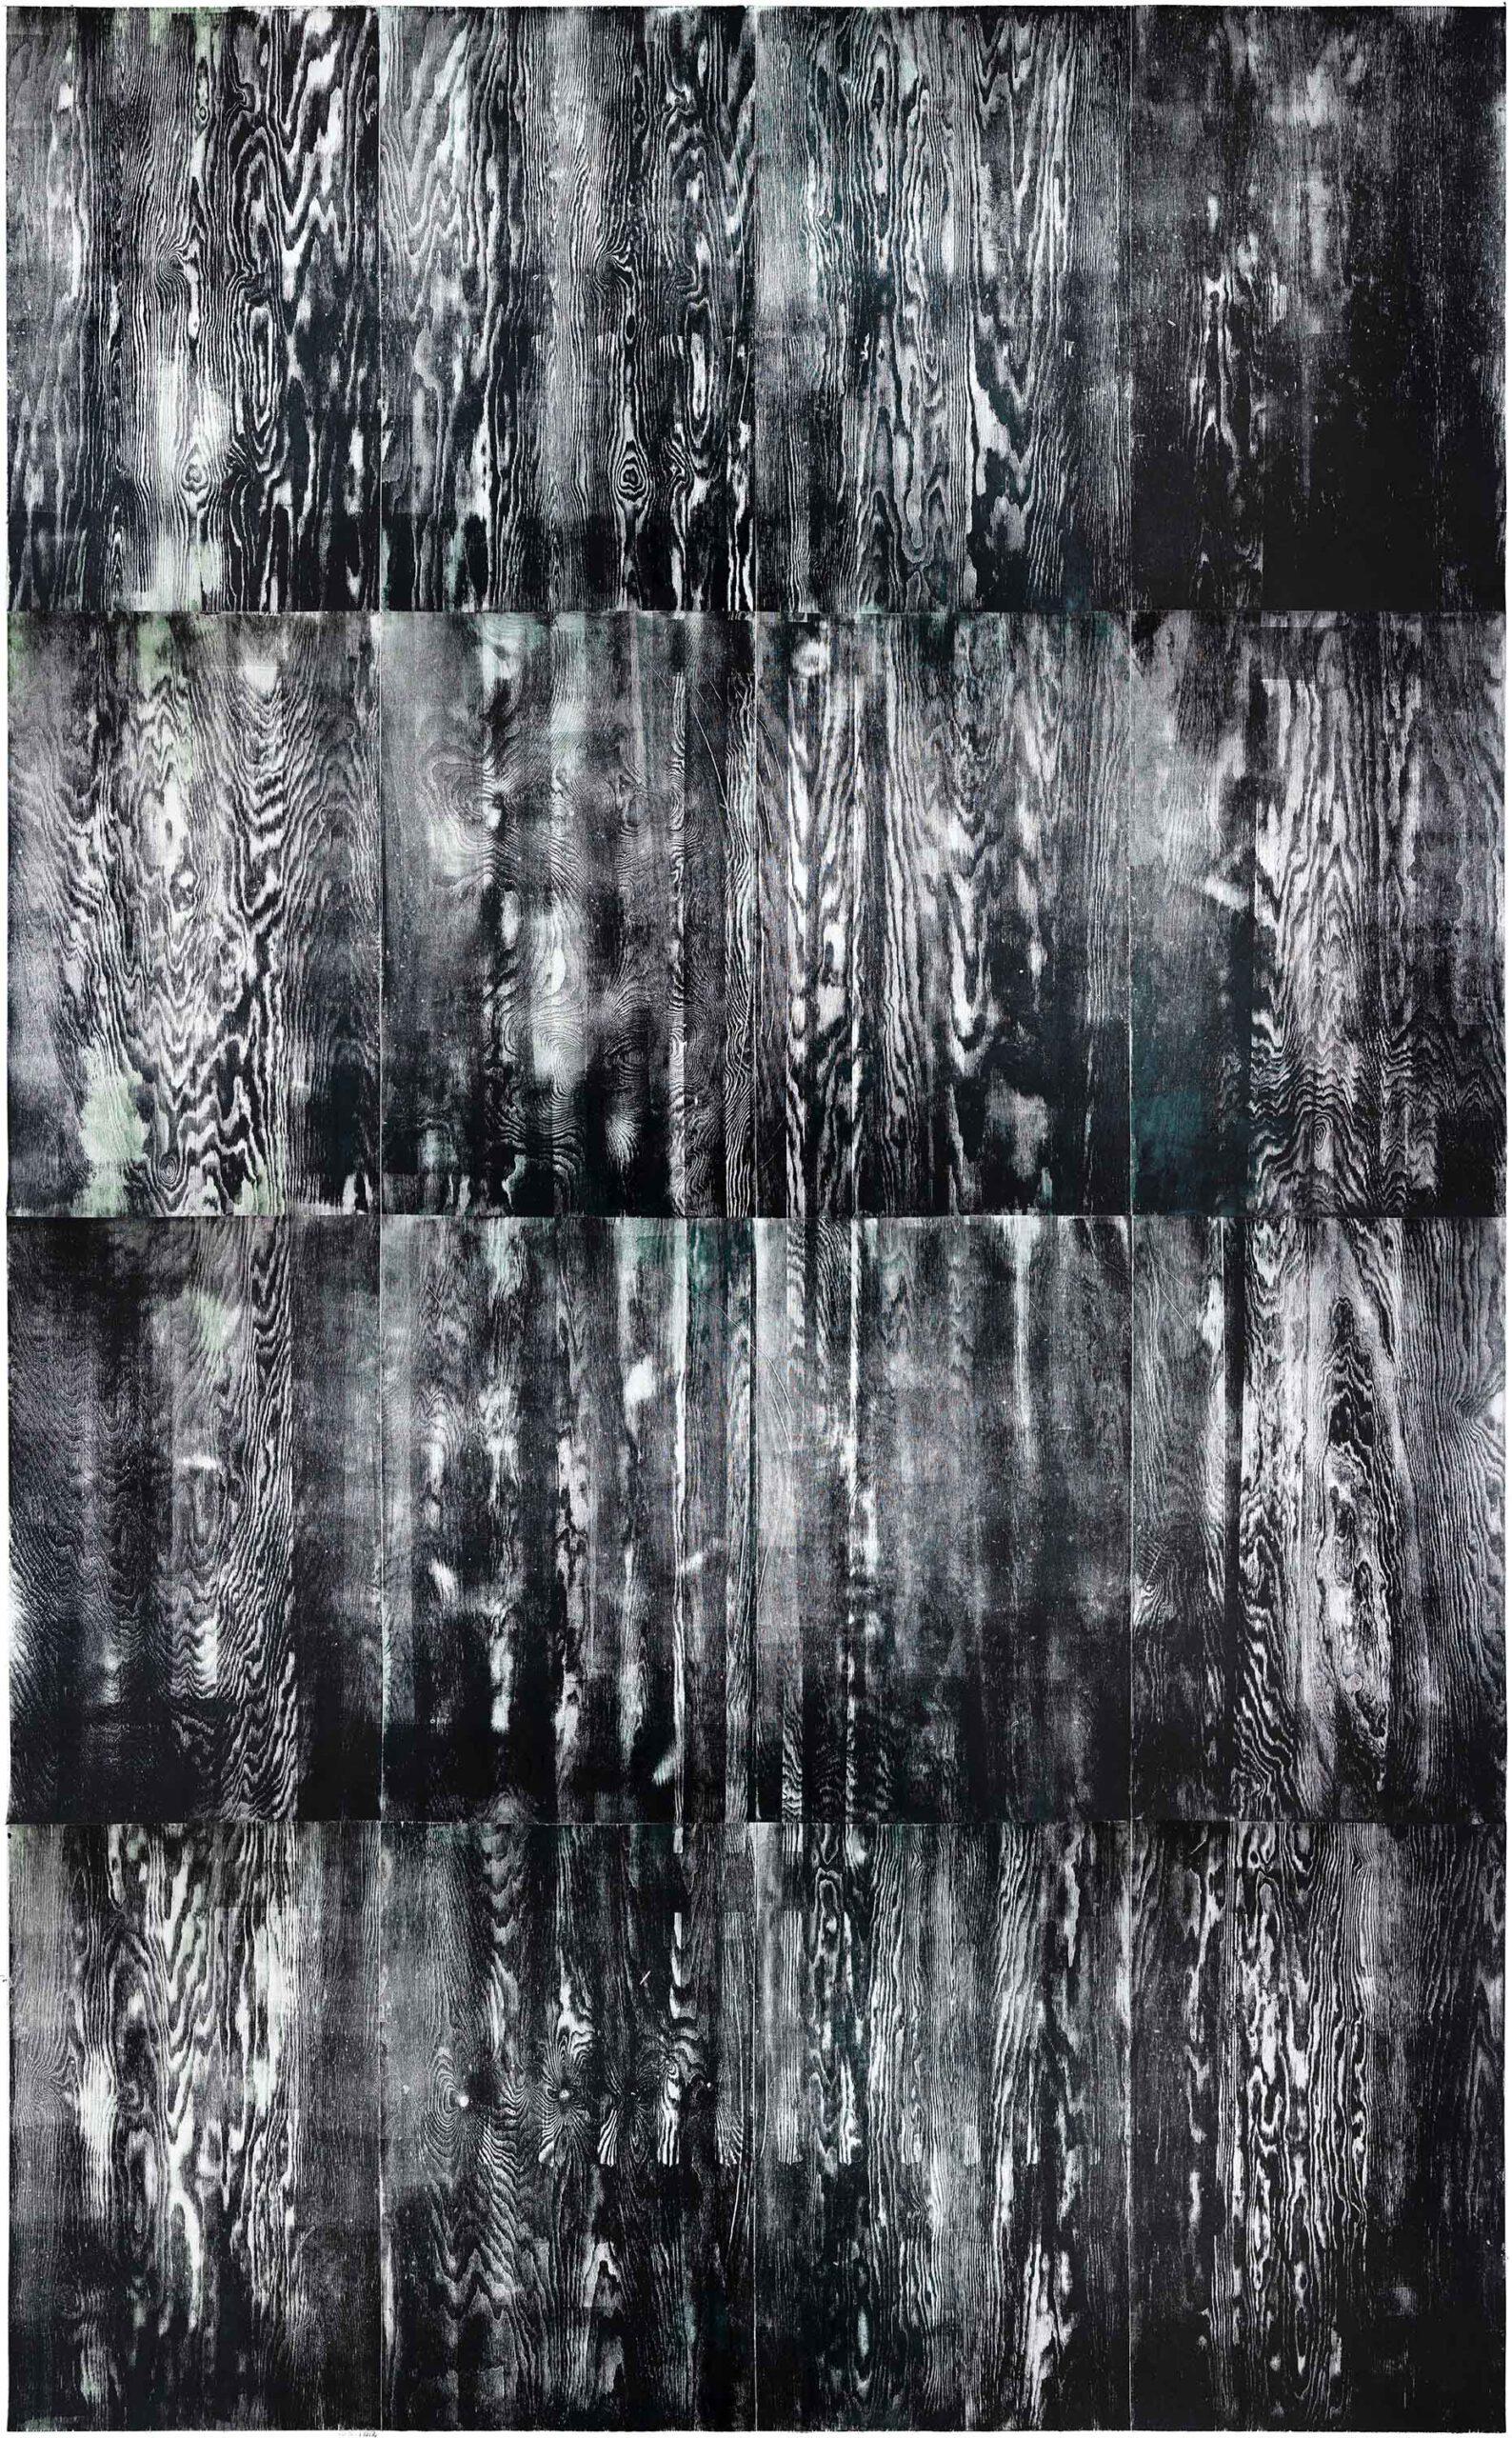 Heating 2, 2020, wood engraving, 408 x 257,3 cm, Genaro Strobel